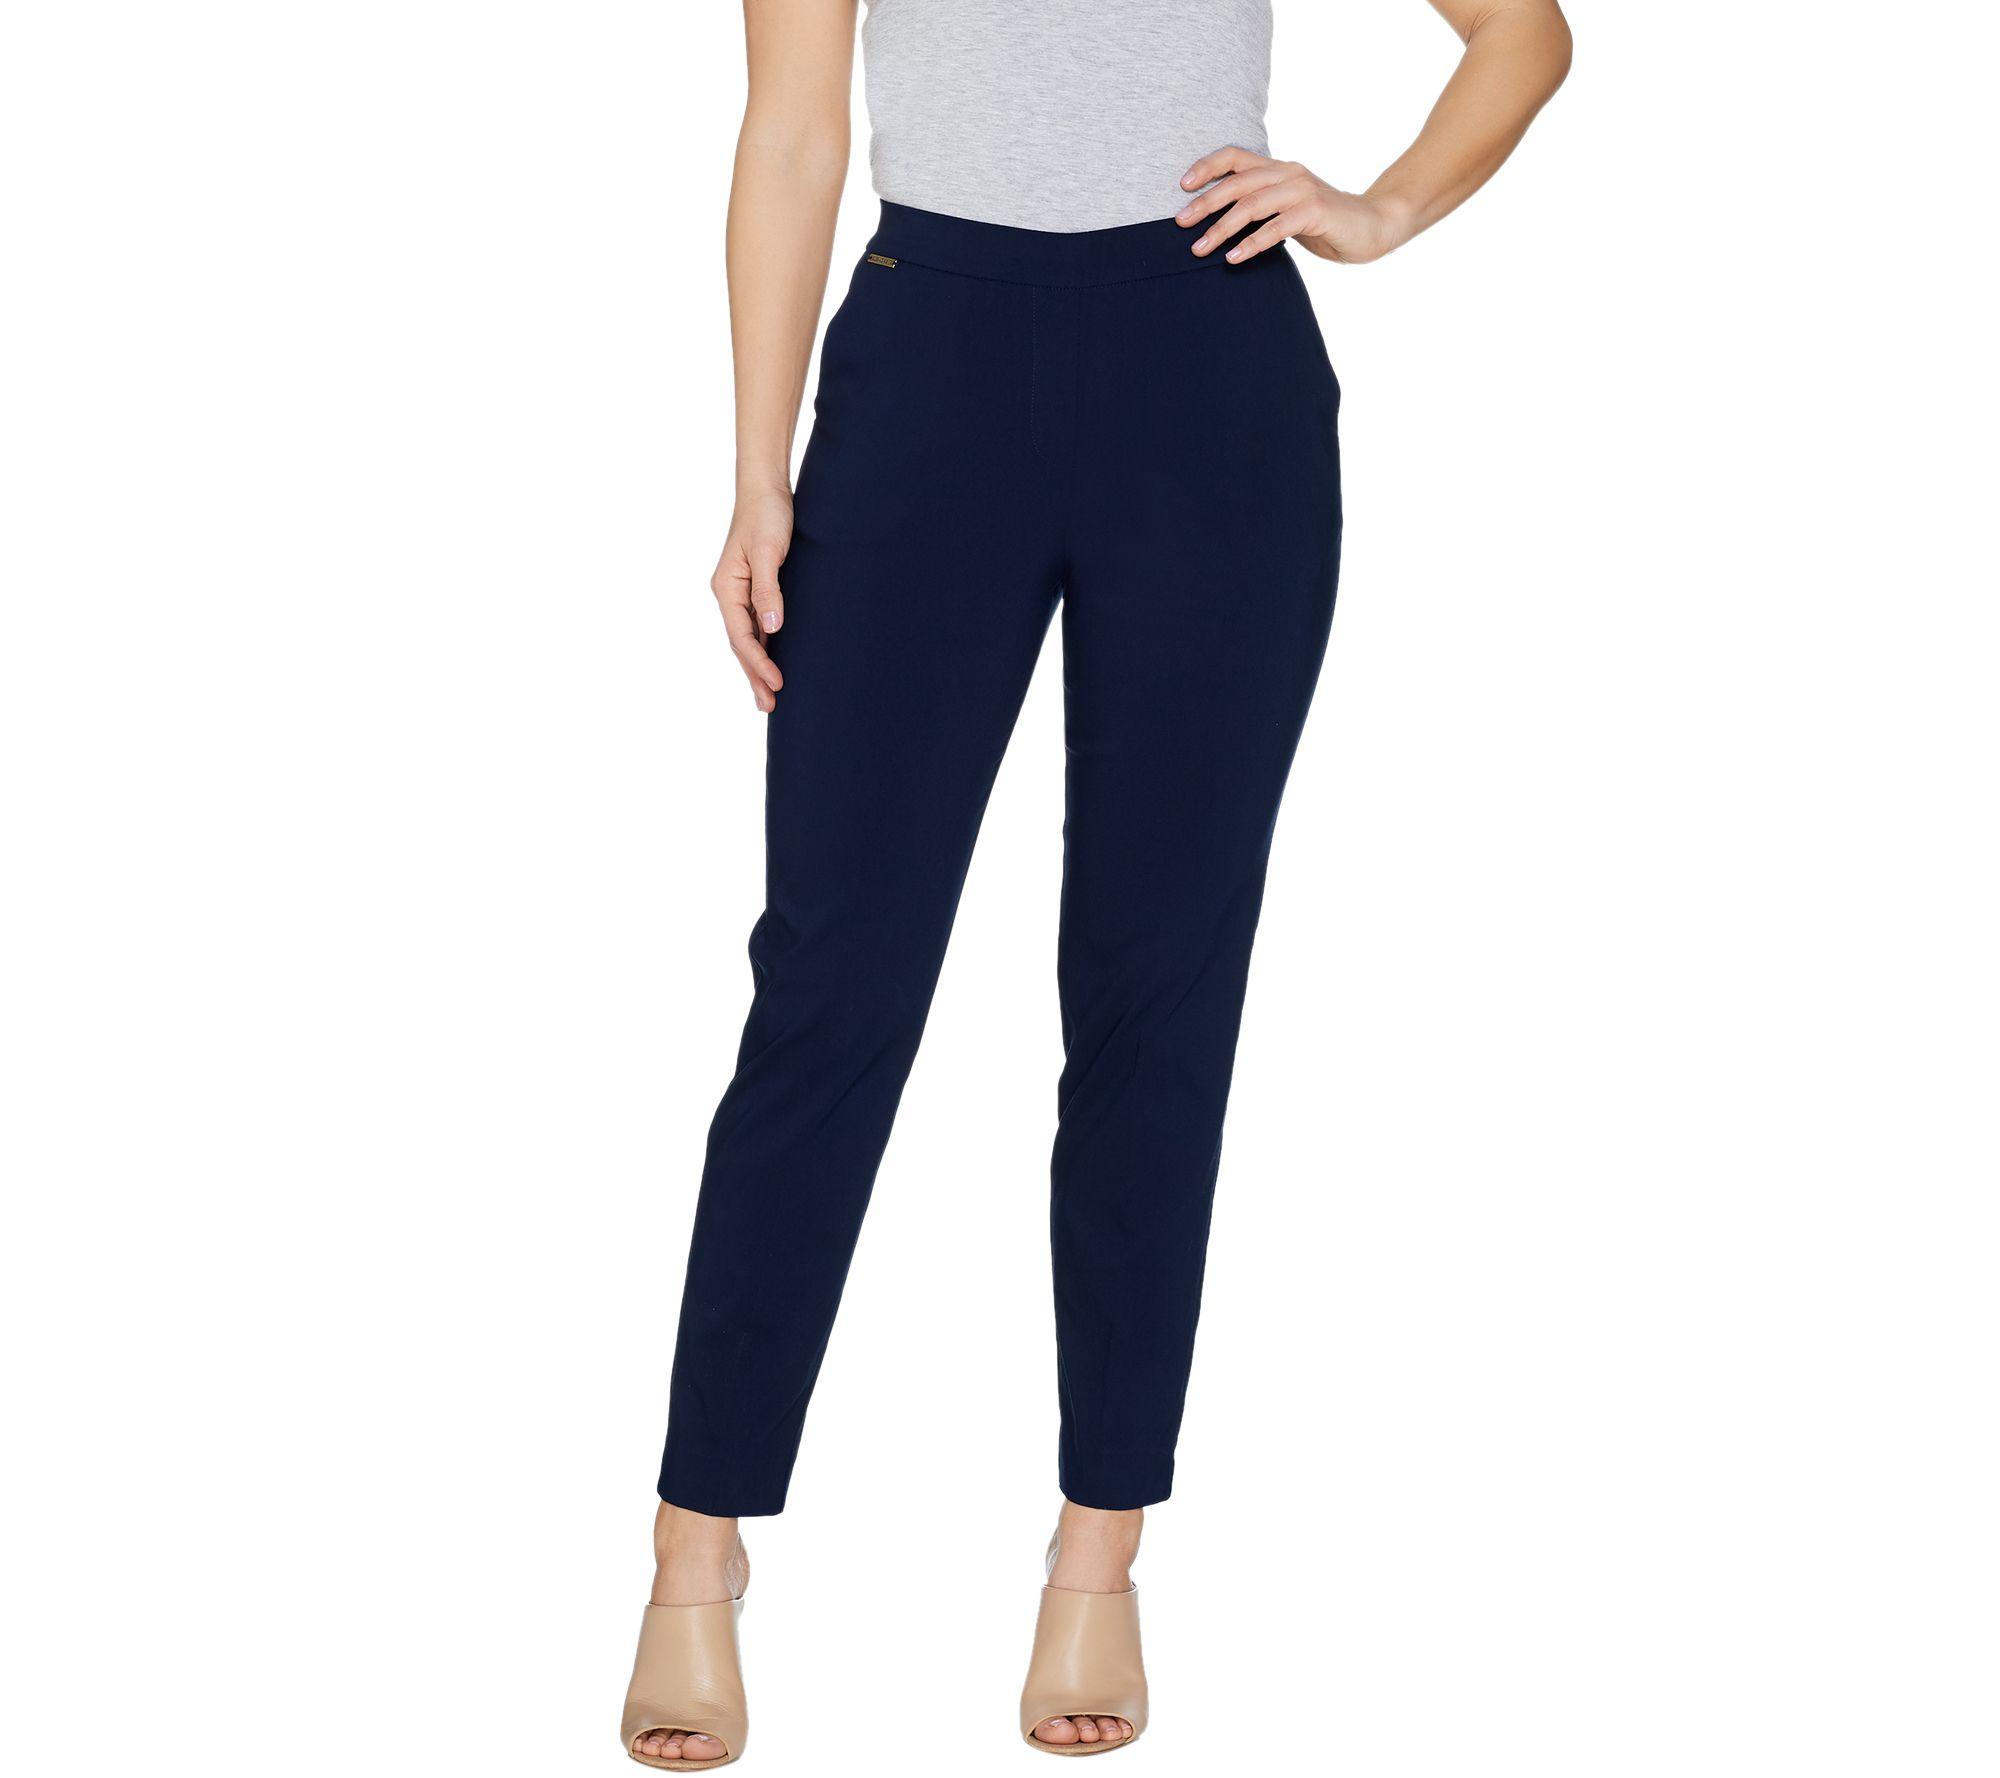 GRAVER Susan Graver Ultra Stretch Pull-On Slim Leg Ankle Pants - A301160.  Best Seller